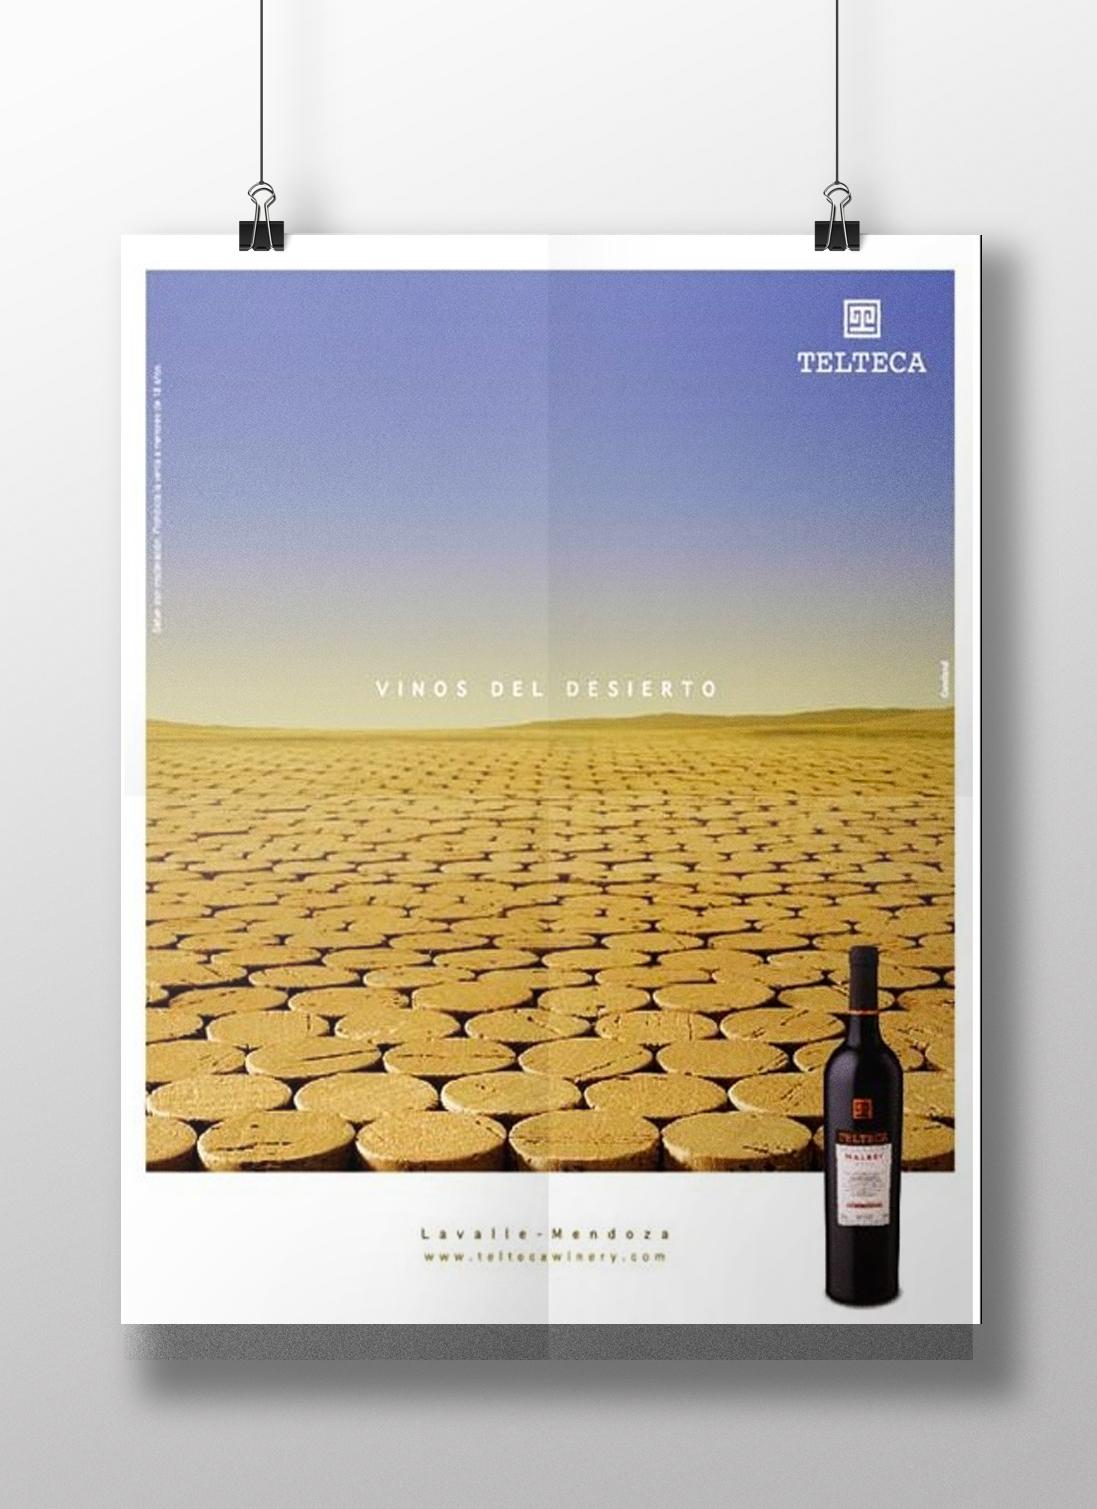 Telteca - Vinos del desierto